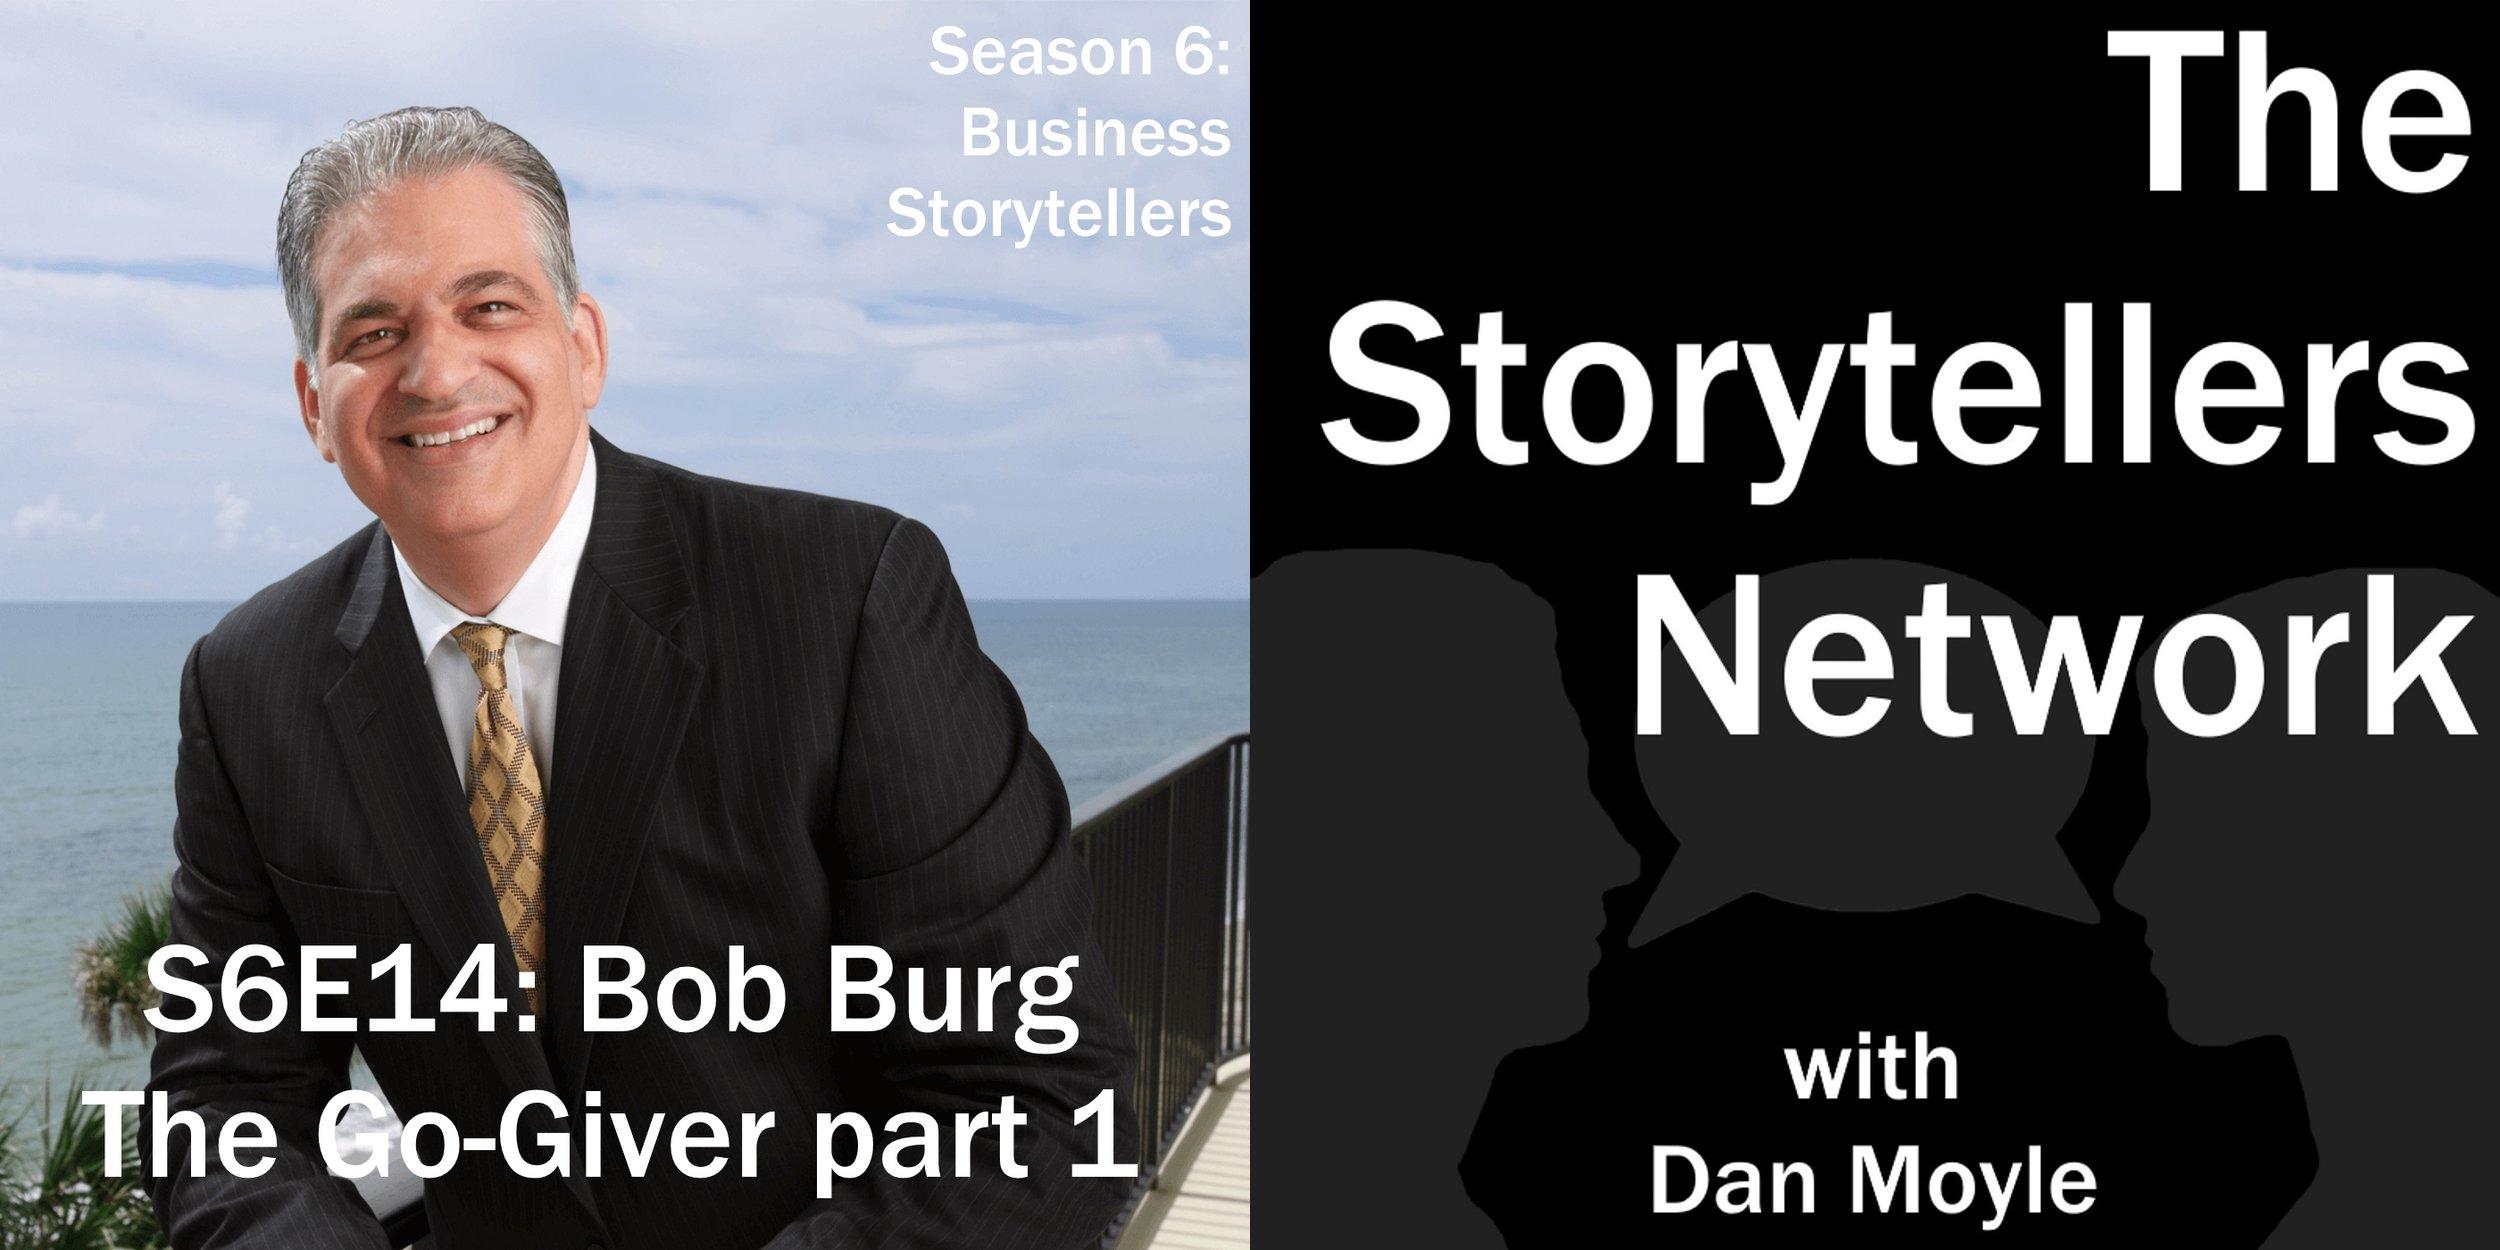 14 Bob Burg Episode Artwork.jpg